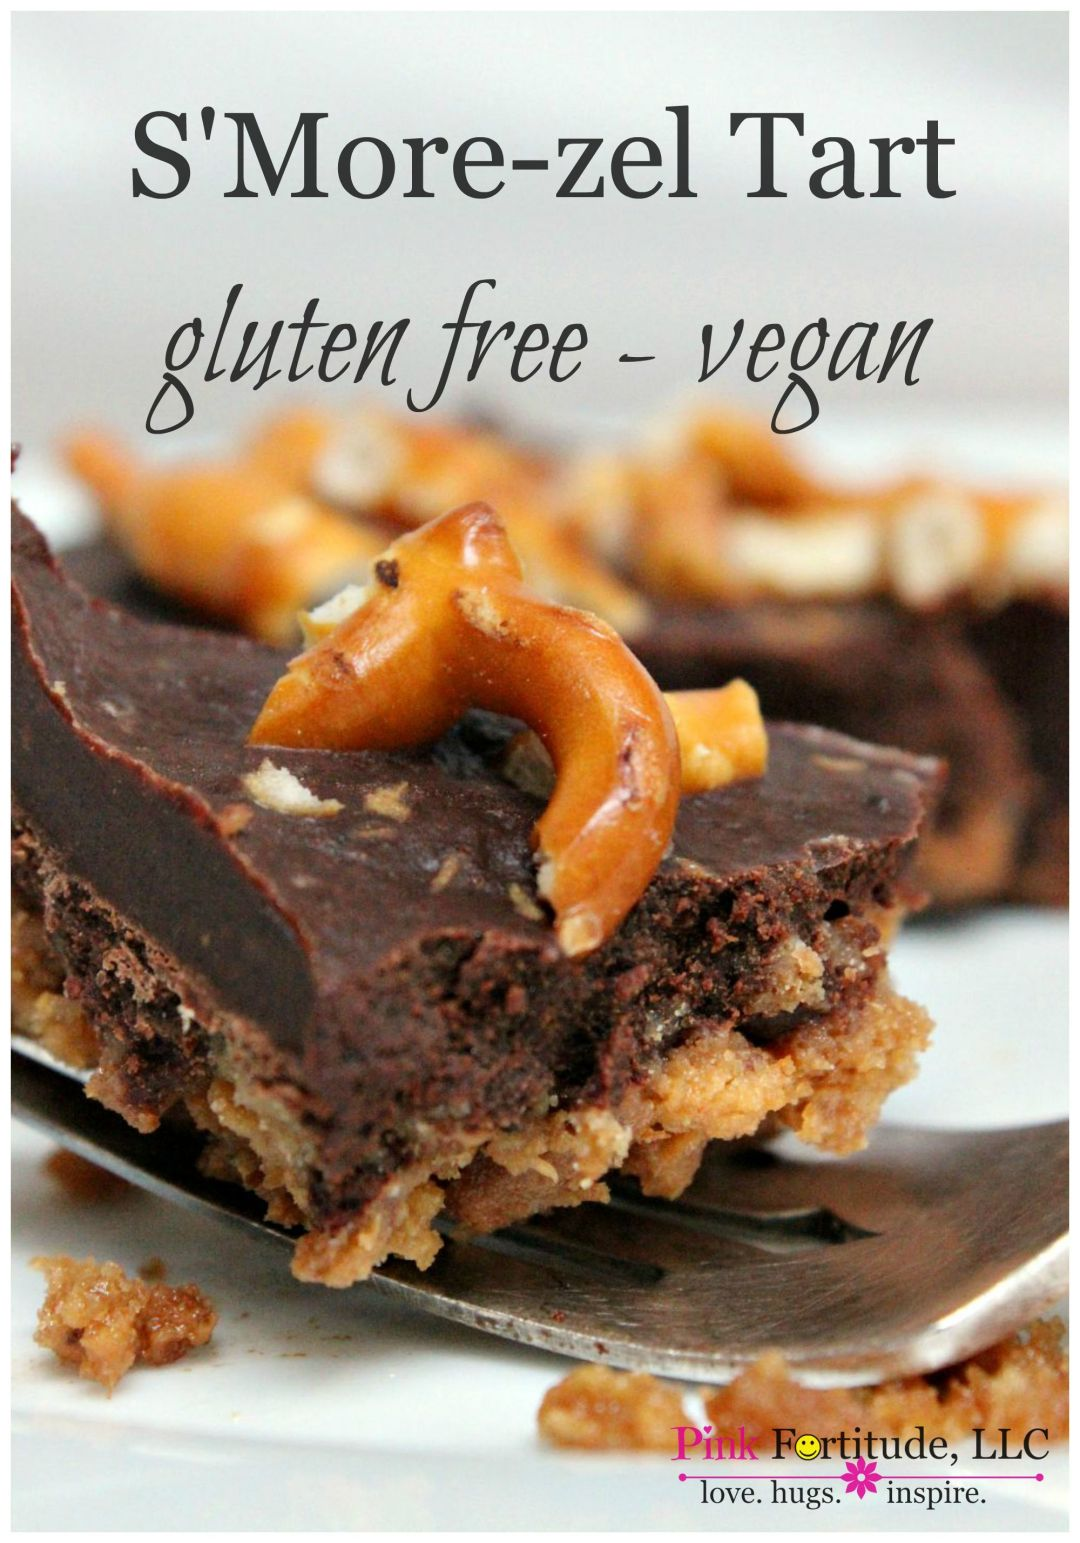 s'more-zel tart gluten free and vegan by coconutheadsurvivalguide.com #lovebeanfudge #schar